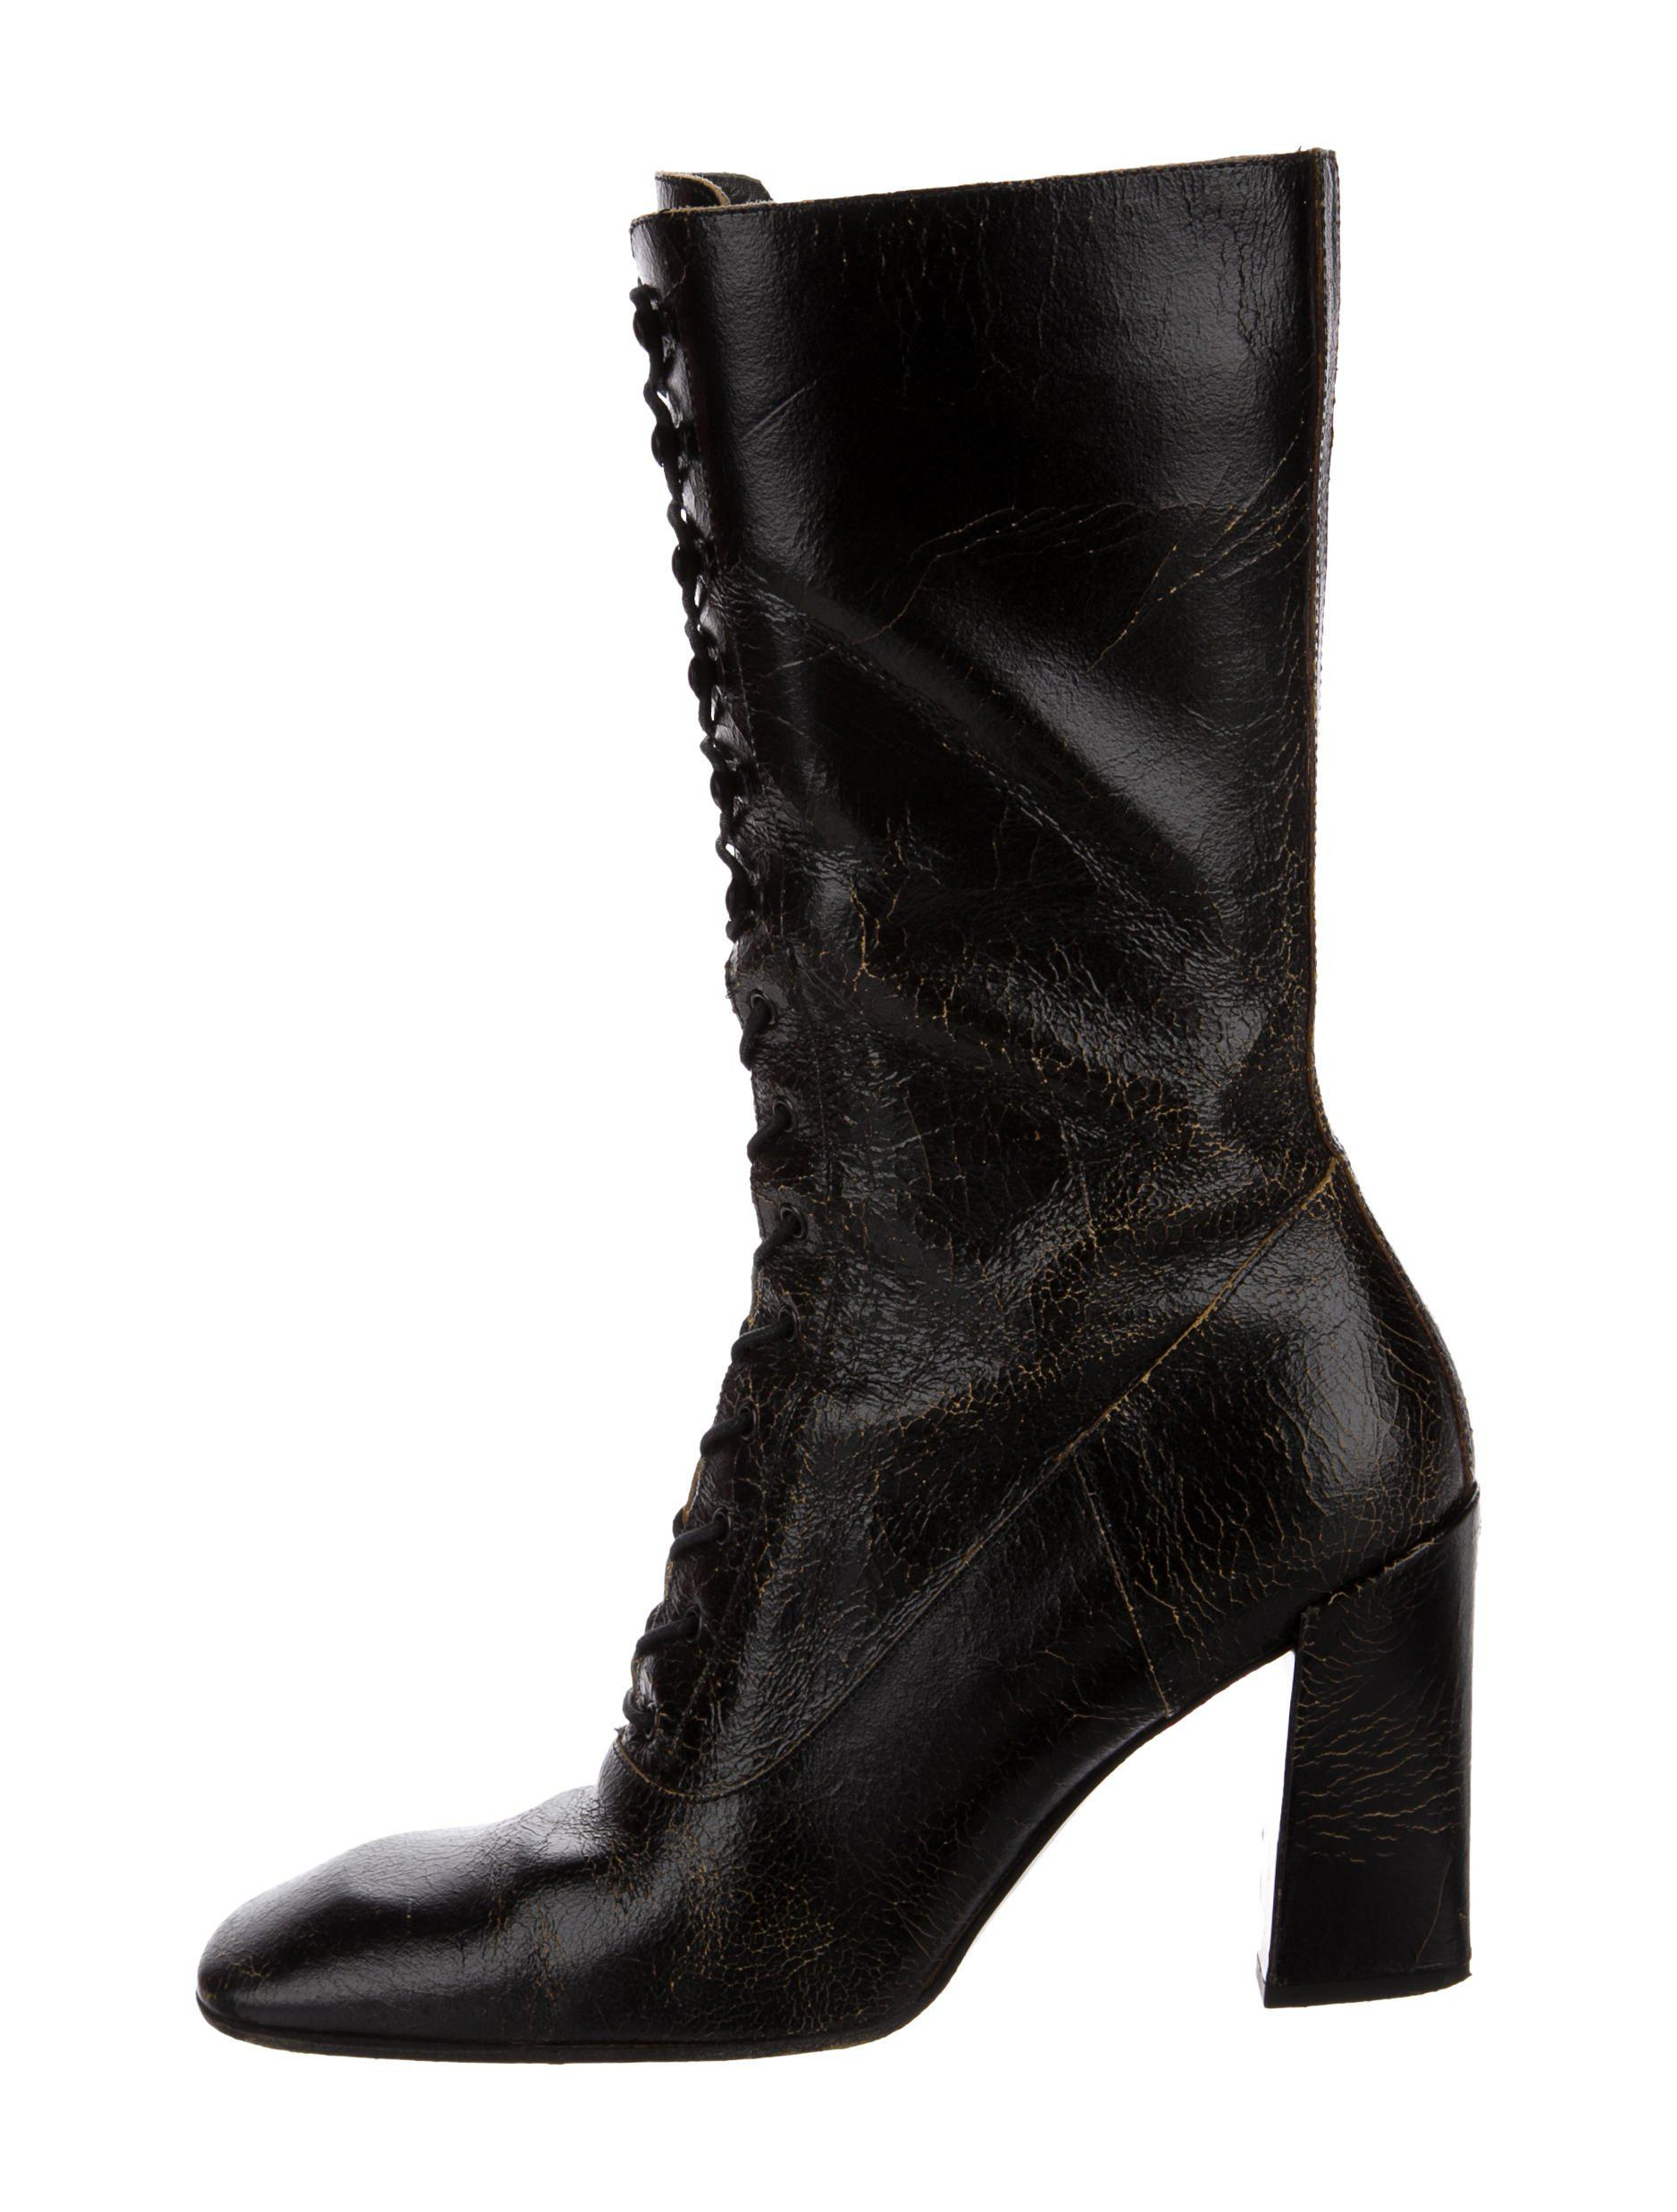 Miu Miu Black Kori Boots cheap sale 100% original free shipping new arrival pre order online gJcz2